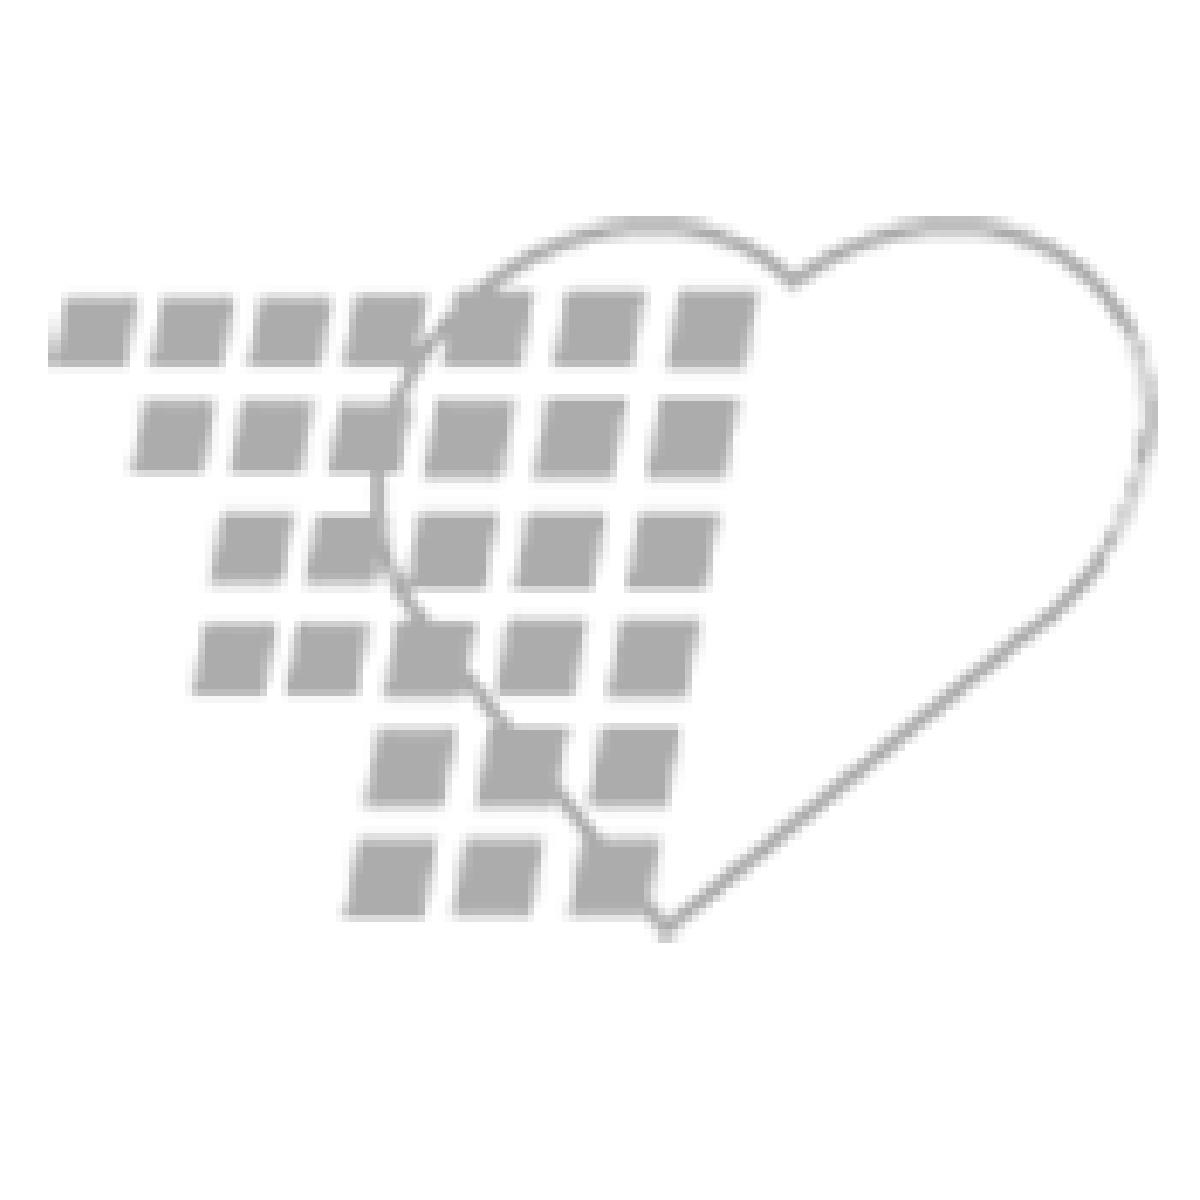 04-50-9221 Pocket Nurse® Wireless Nurse Call System